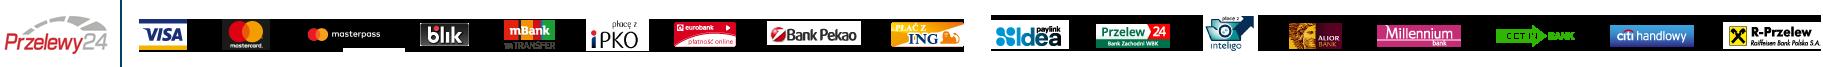 FDP-baner-statyk-980x75-px.jpg